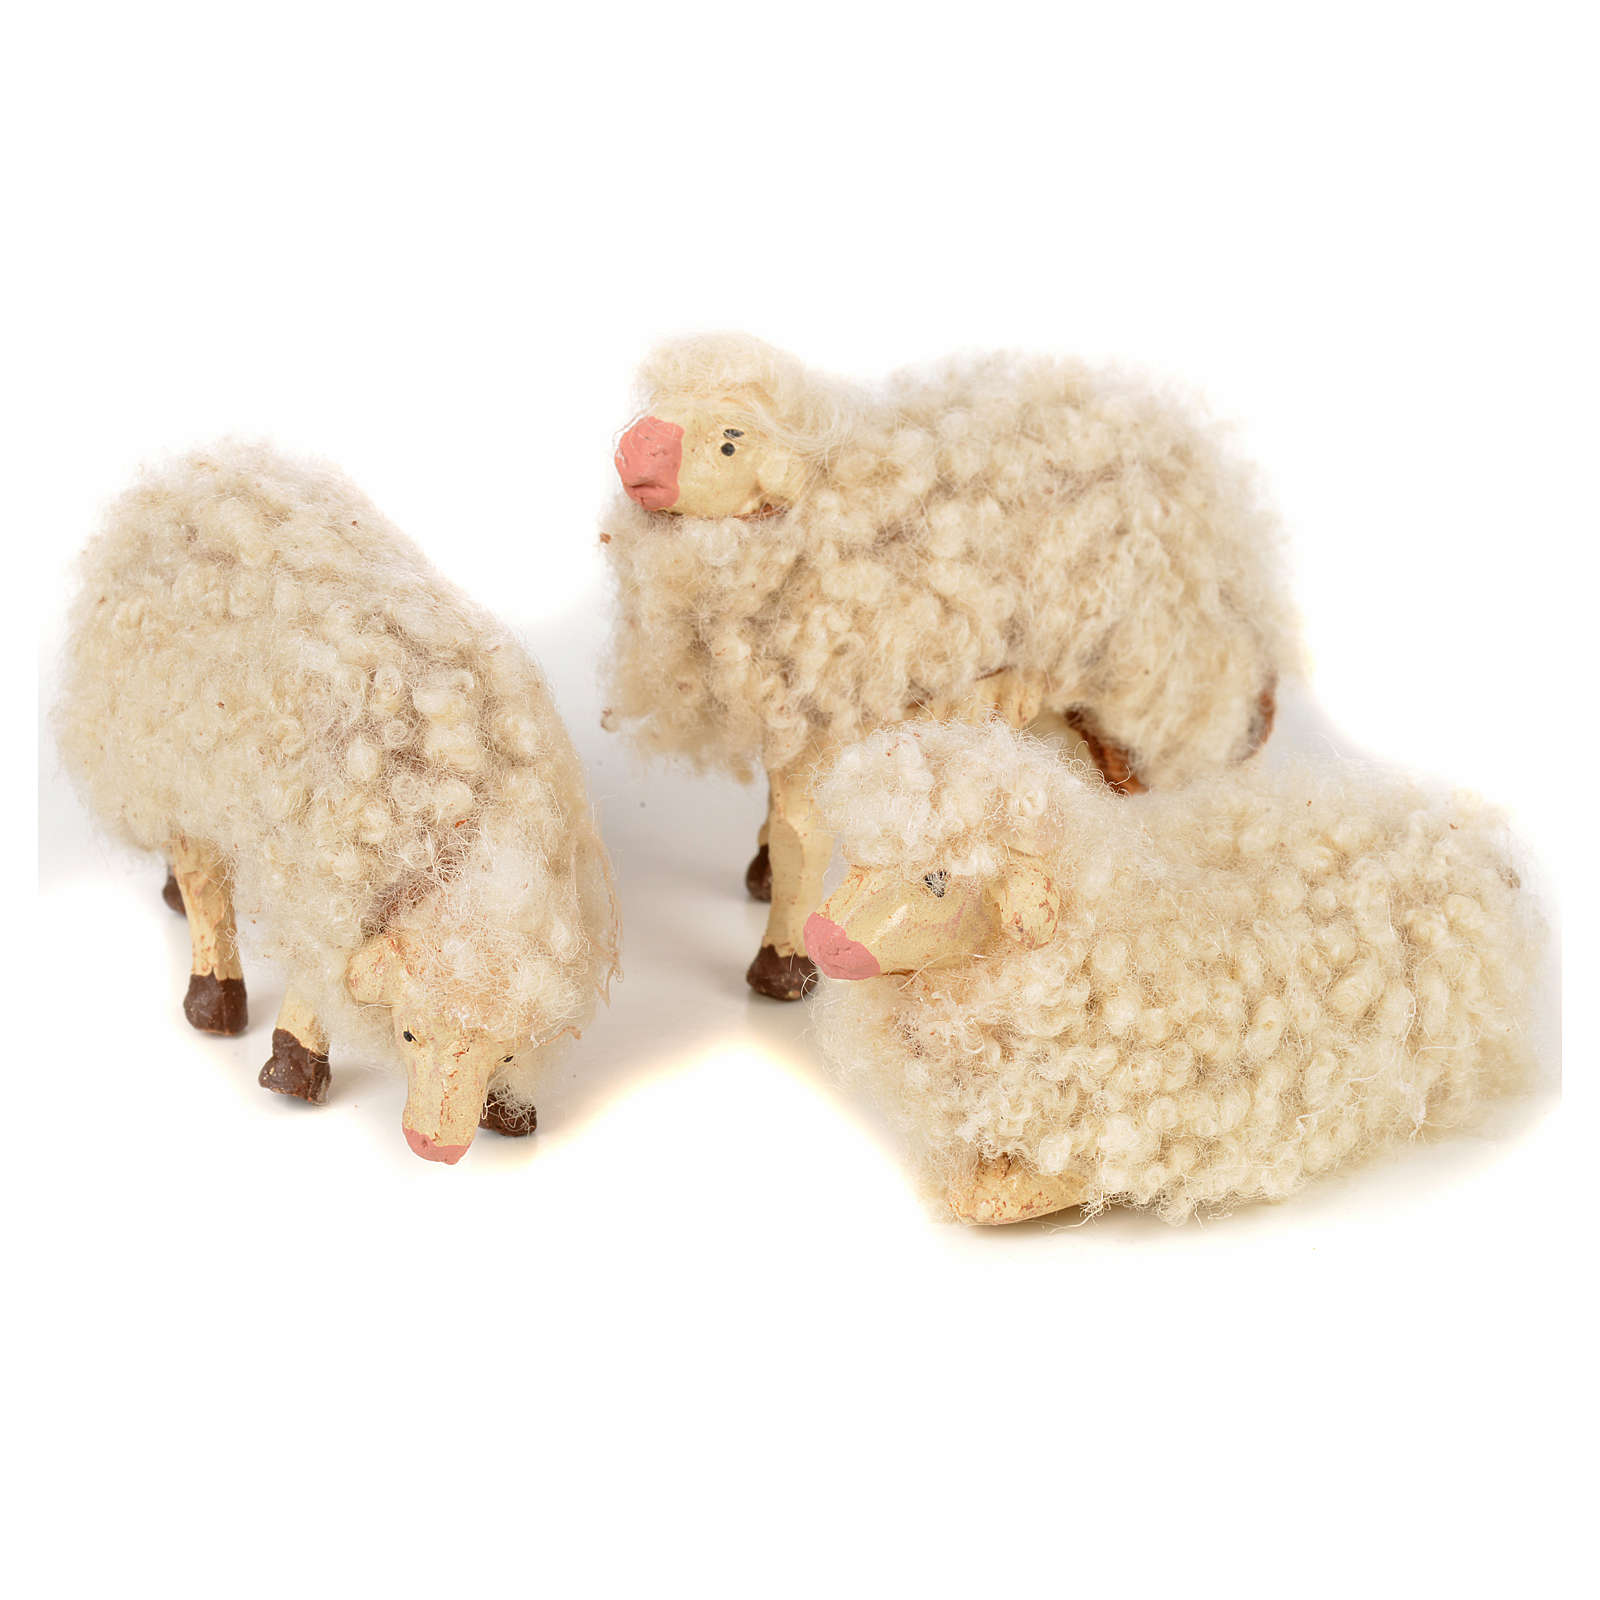 Kit de 3 ovejas con lana 12 cm. belén napolitano 4